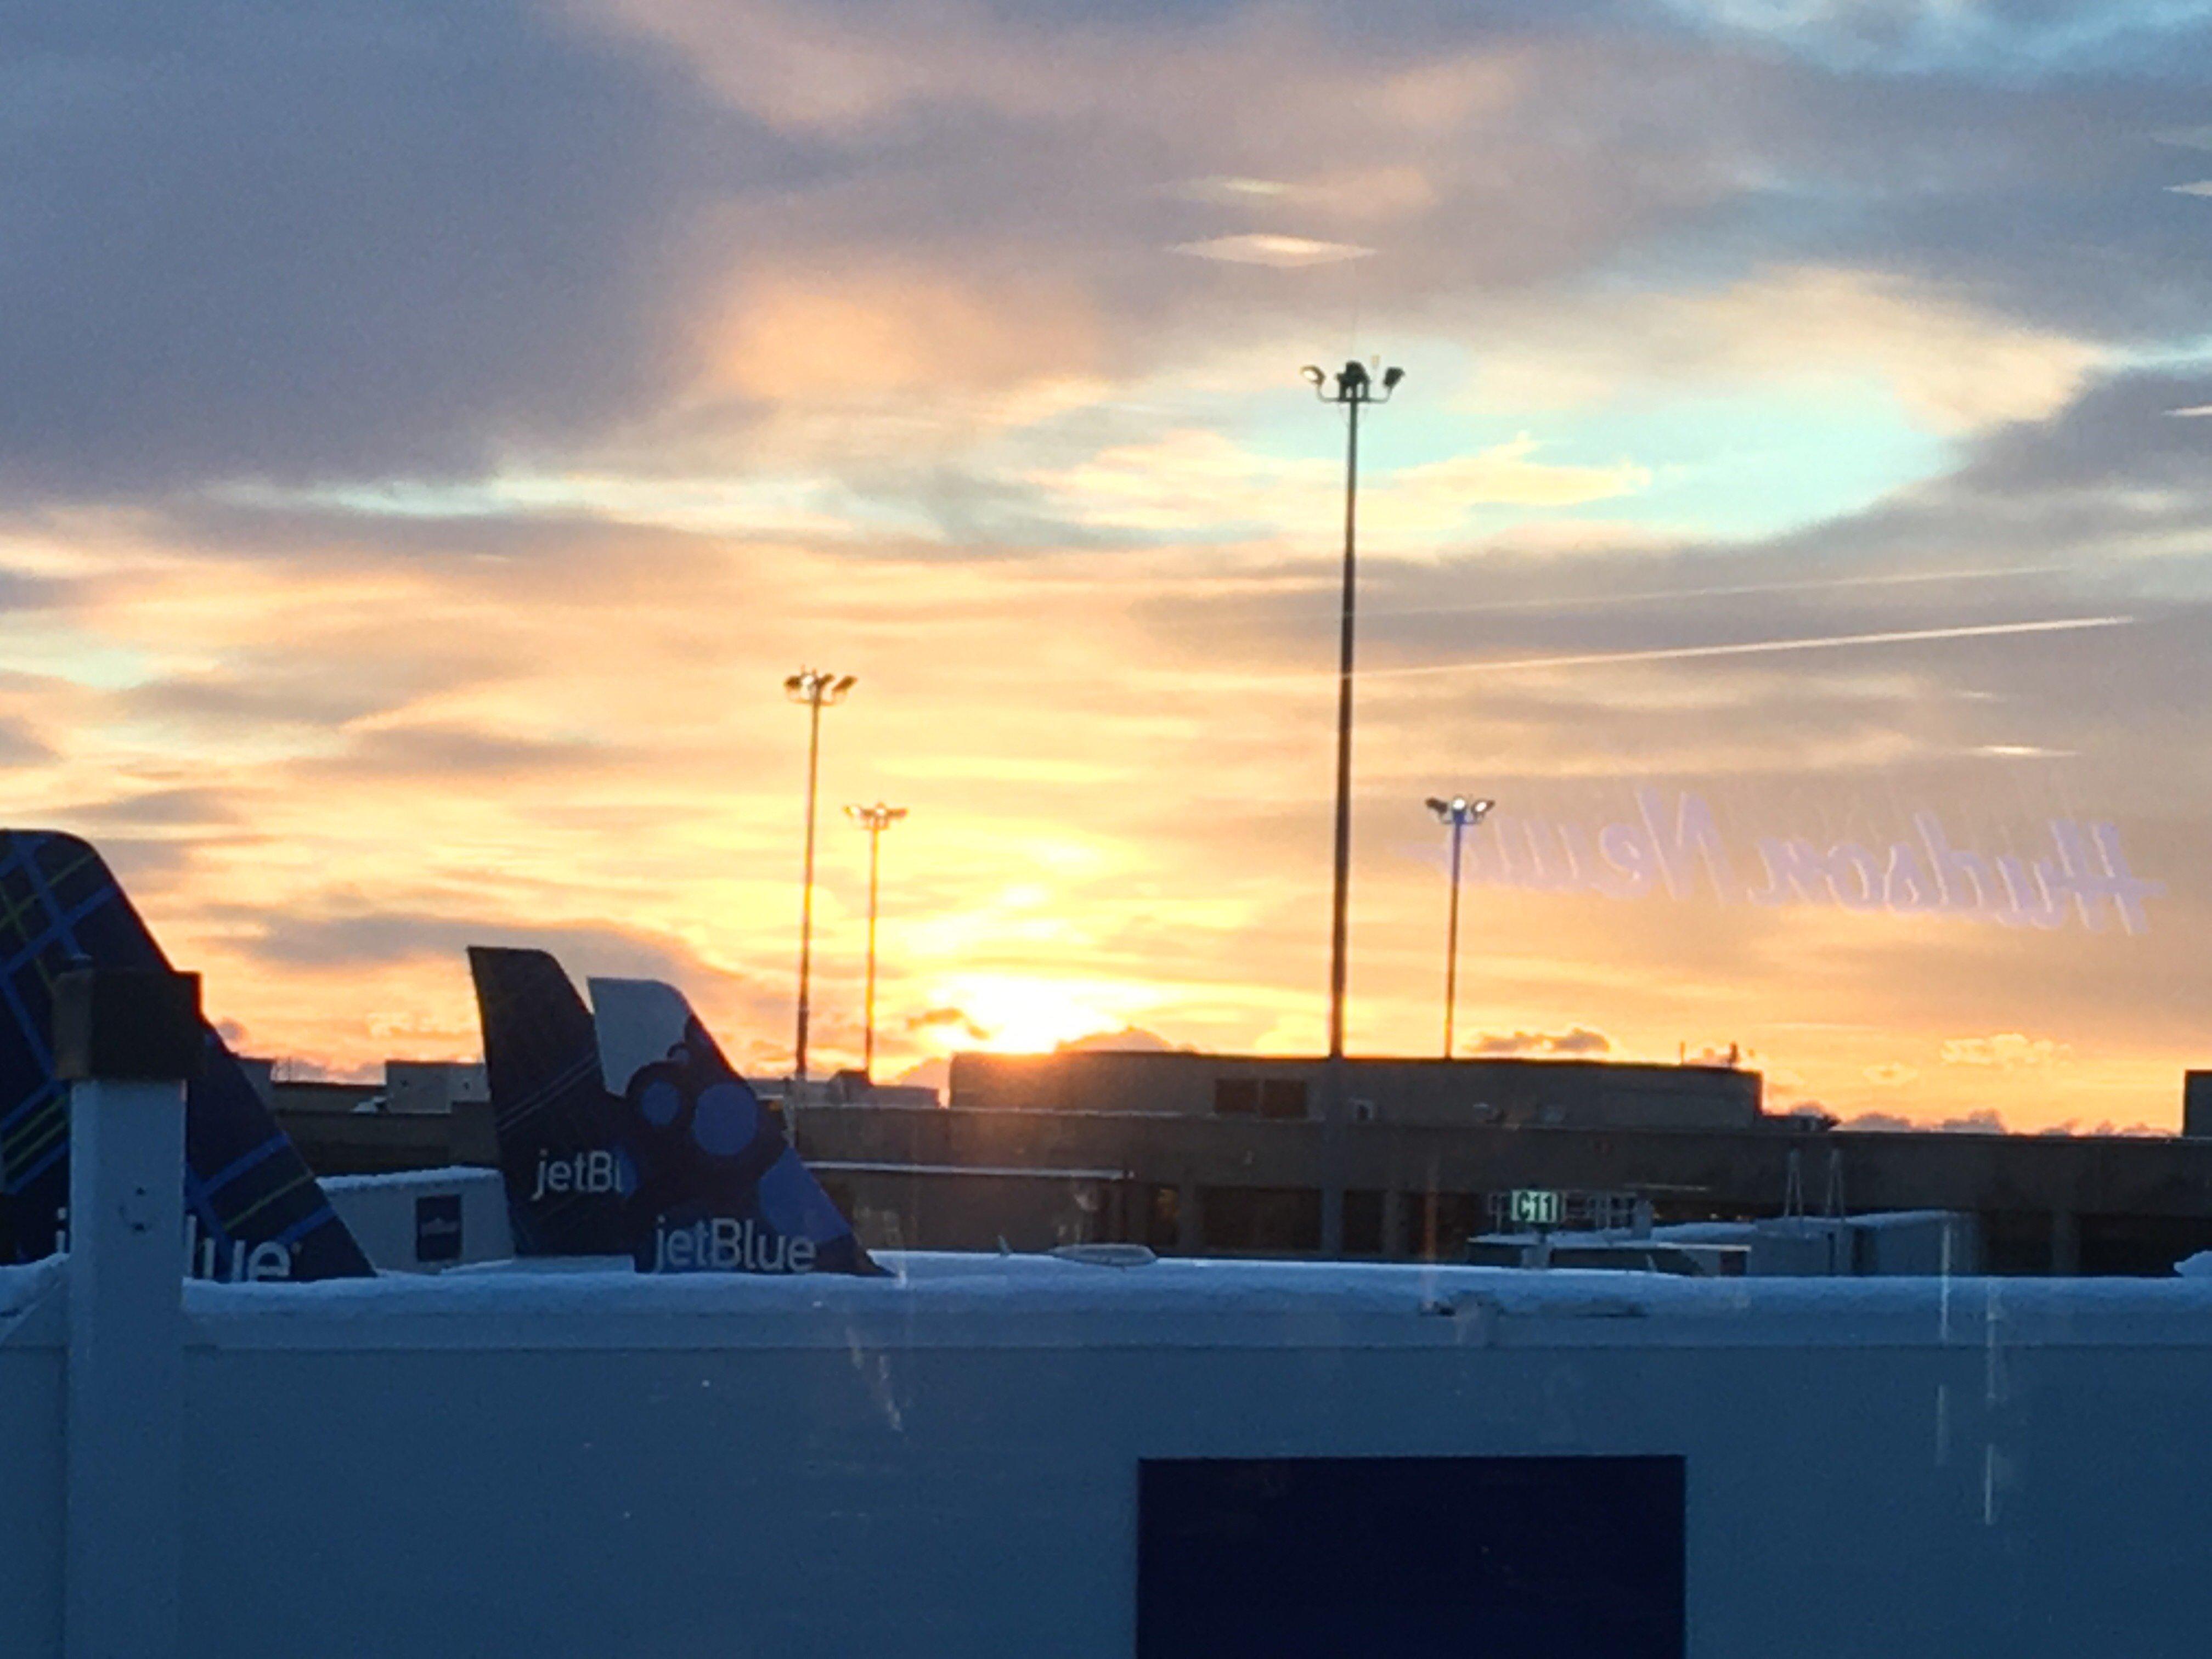 plane_leaving for SXSW